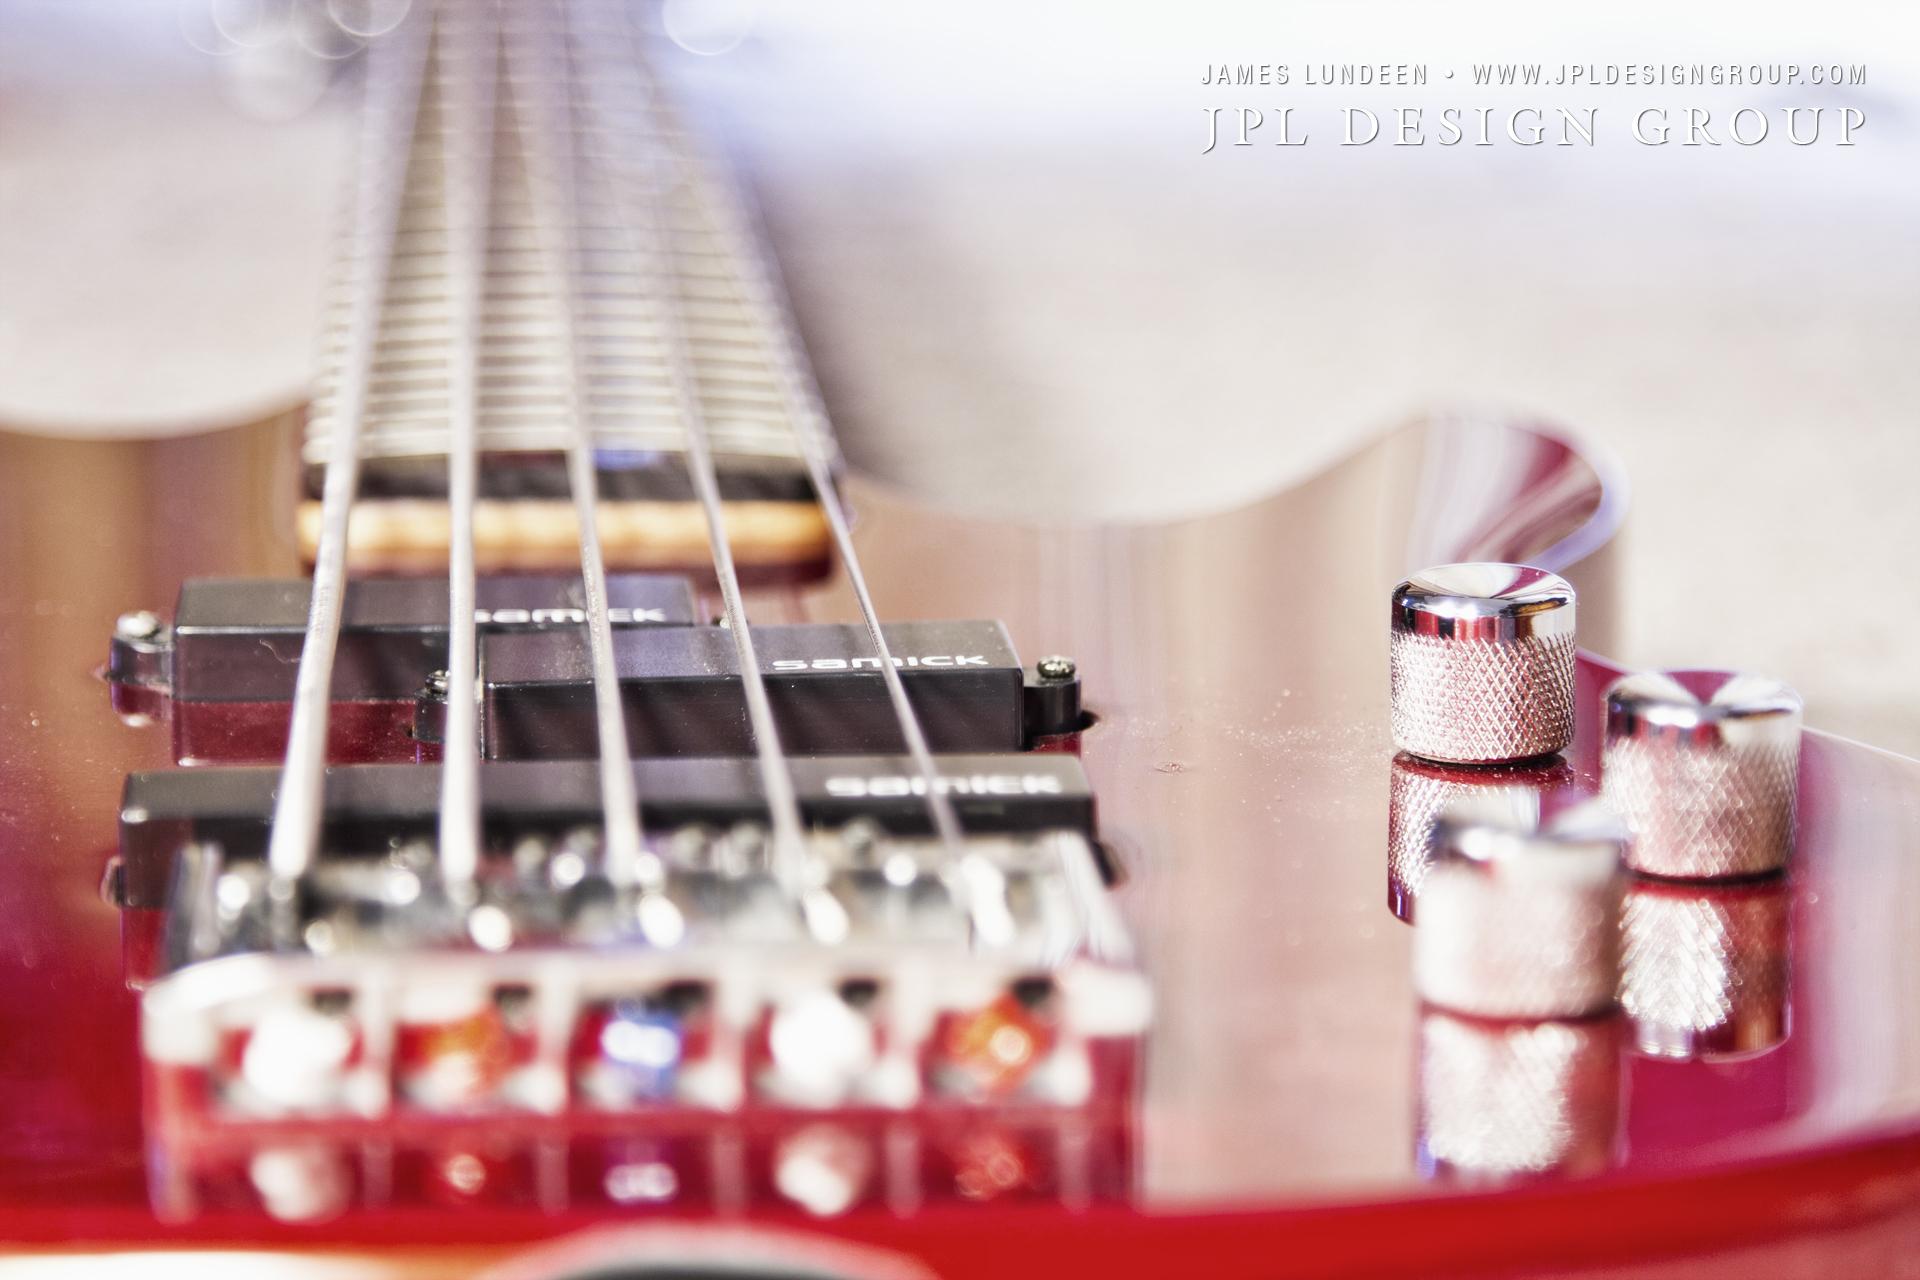 Color Photo of a 5 String Samick Bass Guitar